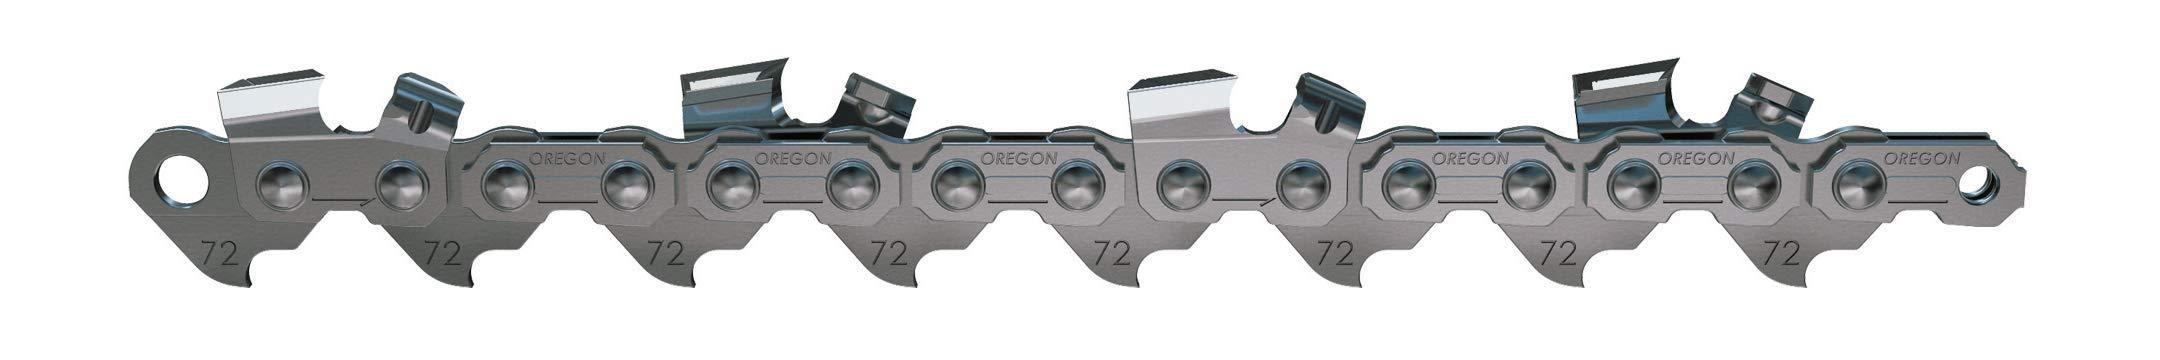 Oregon 70 Drive Link Vanguard 3/8-Inch Pitch, .050-Inch Gauge, Low Kickback Saw Chain 72V070G